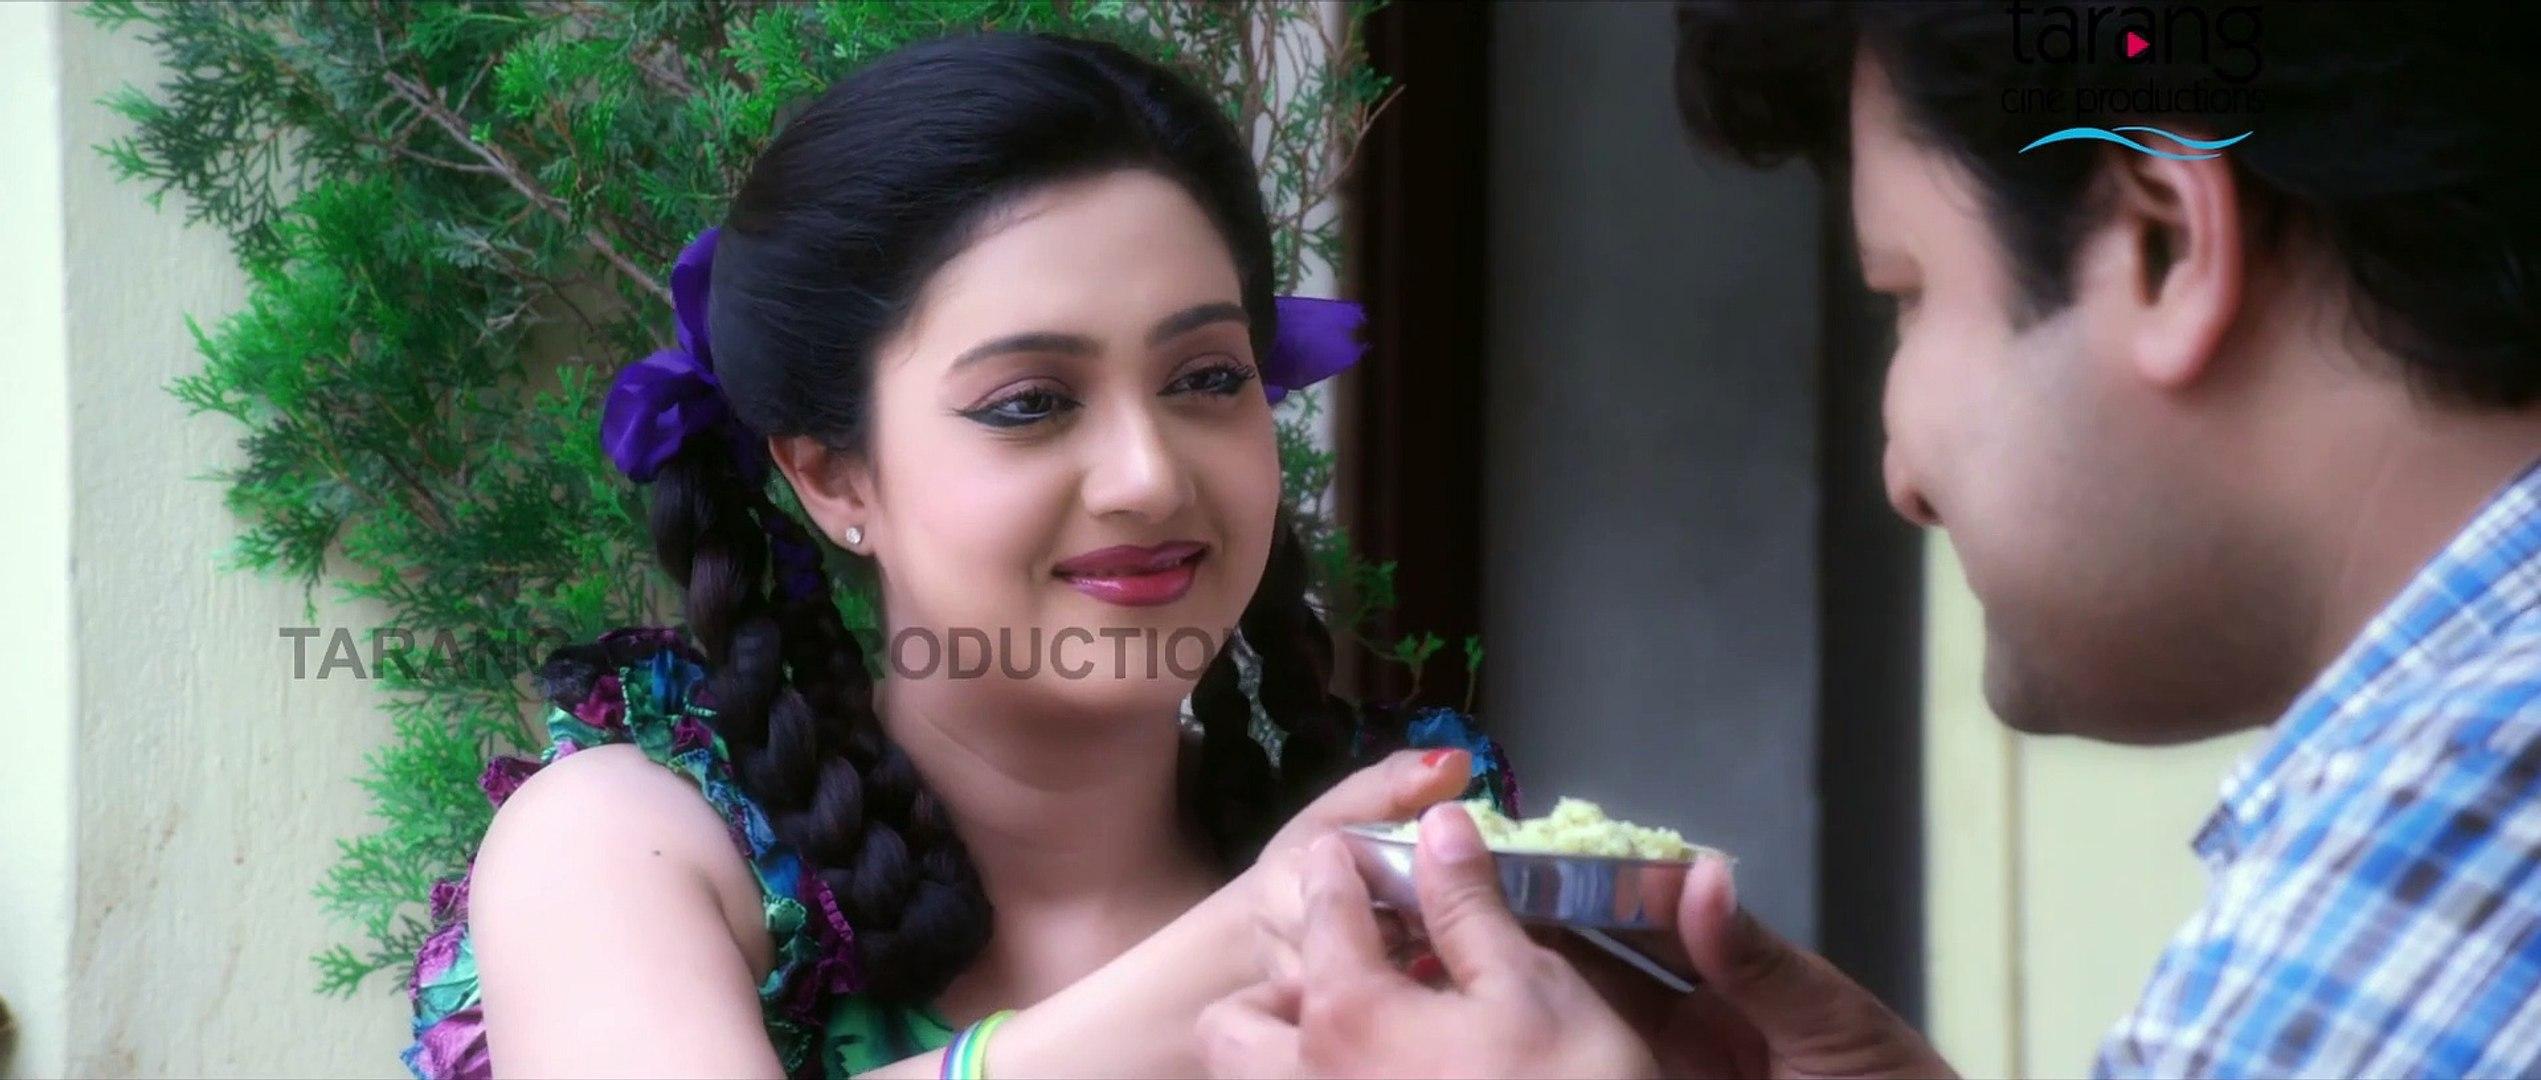 Hae Re Mita HD Video Song - Gapa Hele Bi Sata ODia Film -  Anubhab Mohanty, Barsha Priyadarshini - O